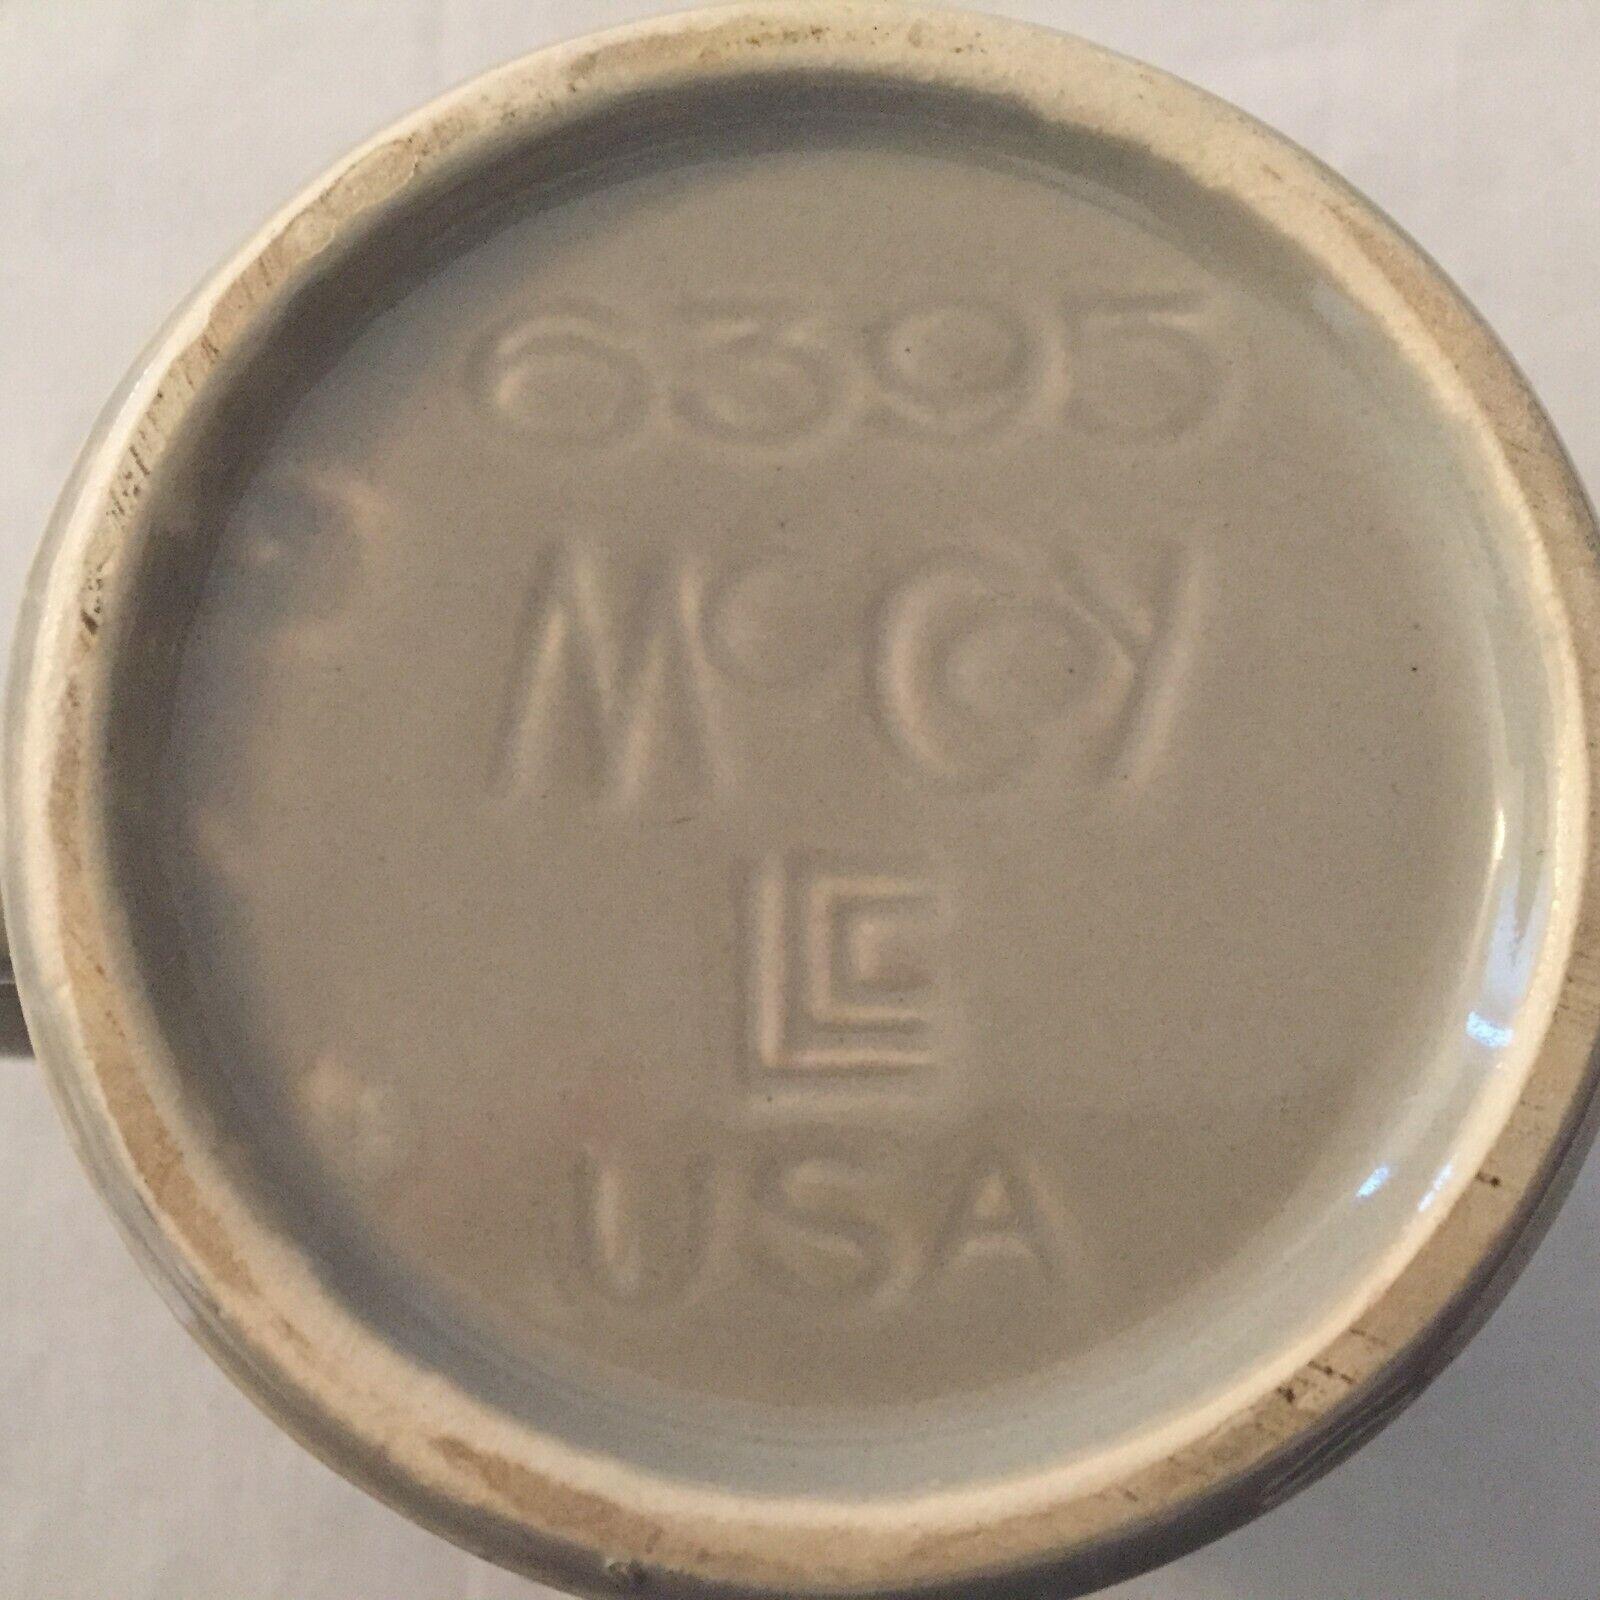 McCoy USA Reichelbrau Kulmbach Gray .5 Liter Stoneware Beer Mug - $19.99